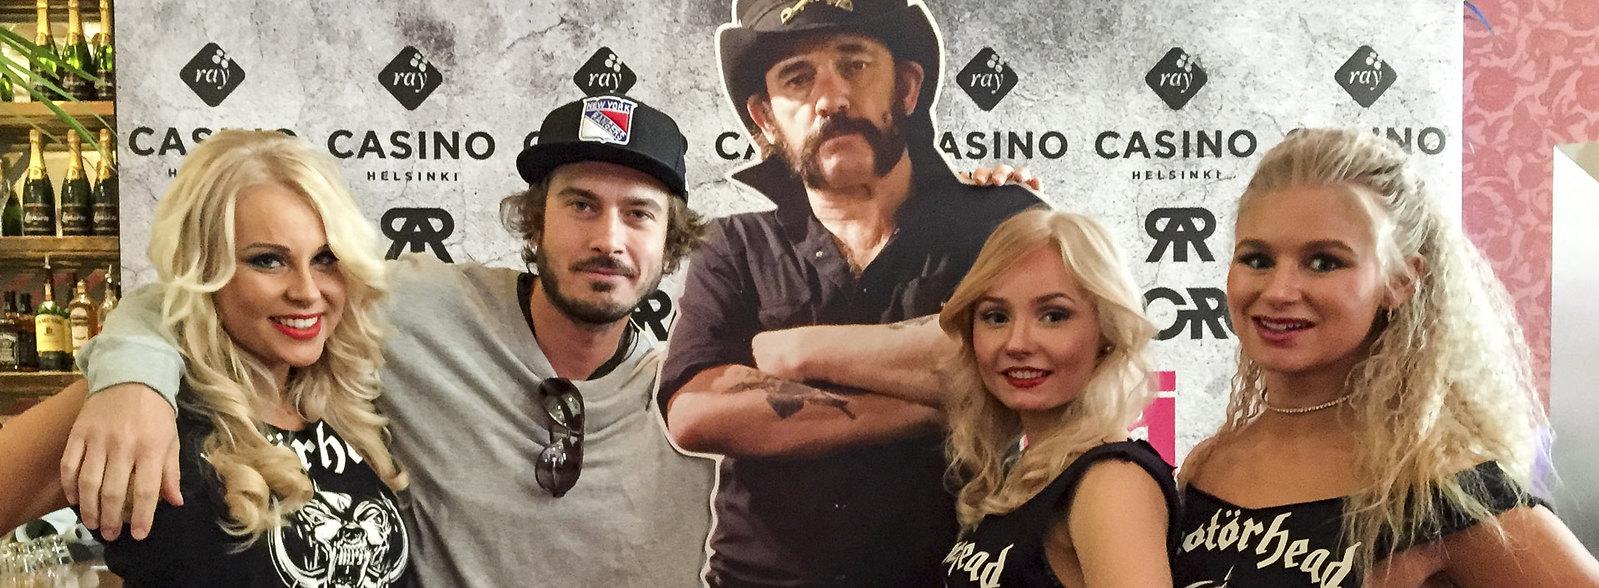 Rock Pokeri 13.2.